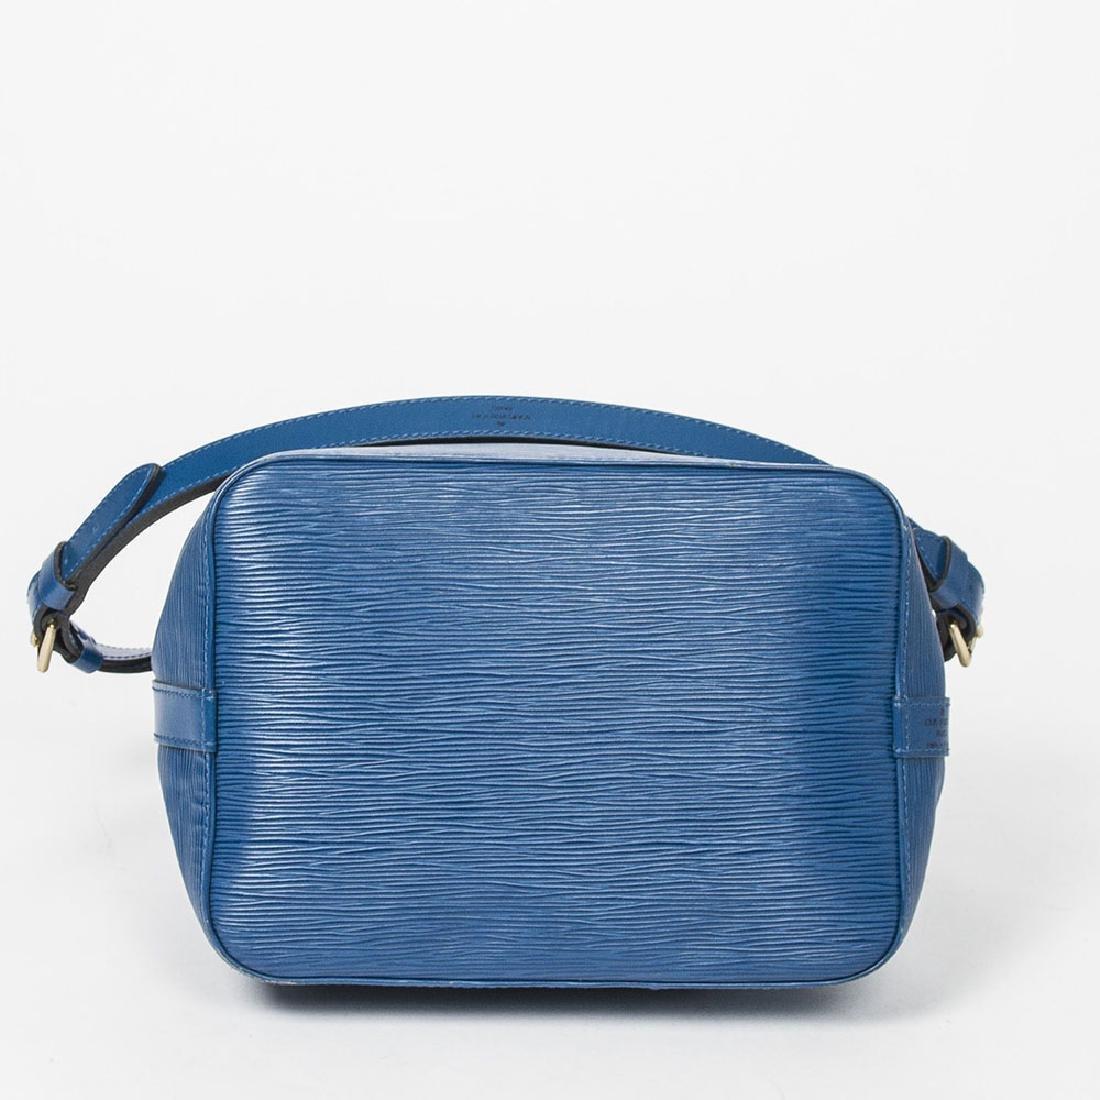 Louis Vuitton Noe - 6